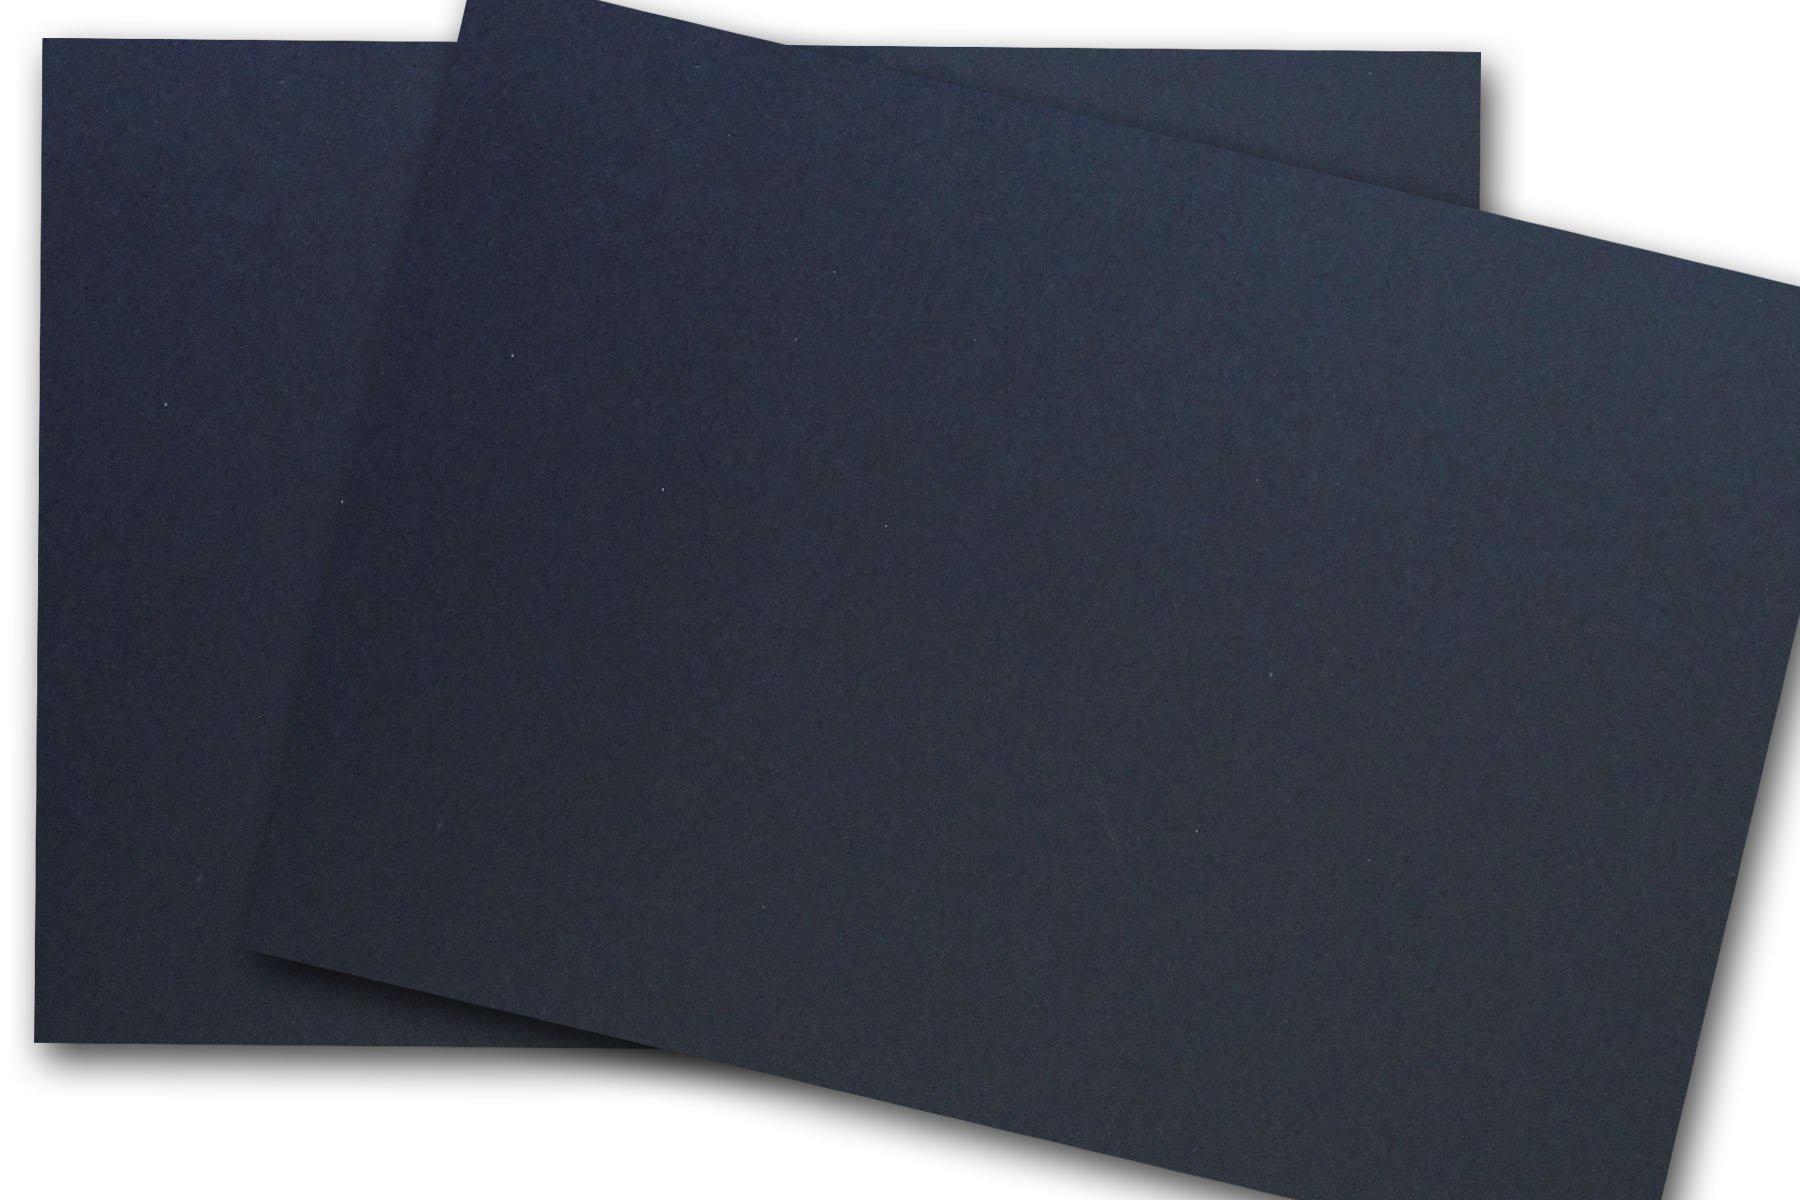 CC 130 lb DTC Heavyweight Card Stock - 25 pk (Epic Black)